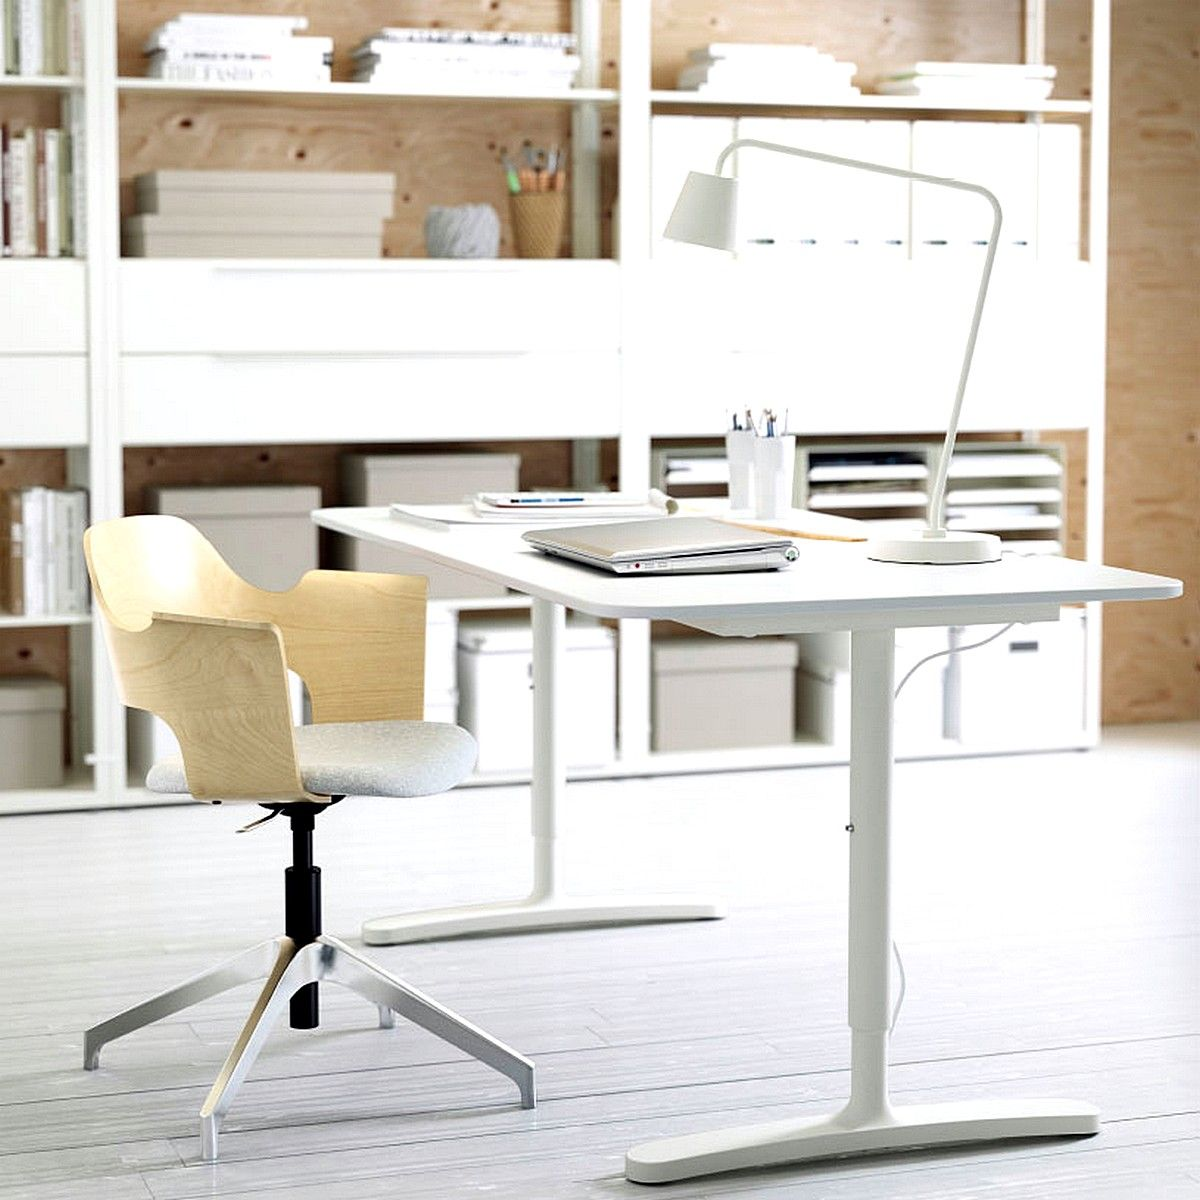 Ikea Bekant Desk White In A Home Office Minimalist Desk Design